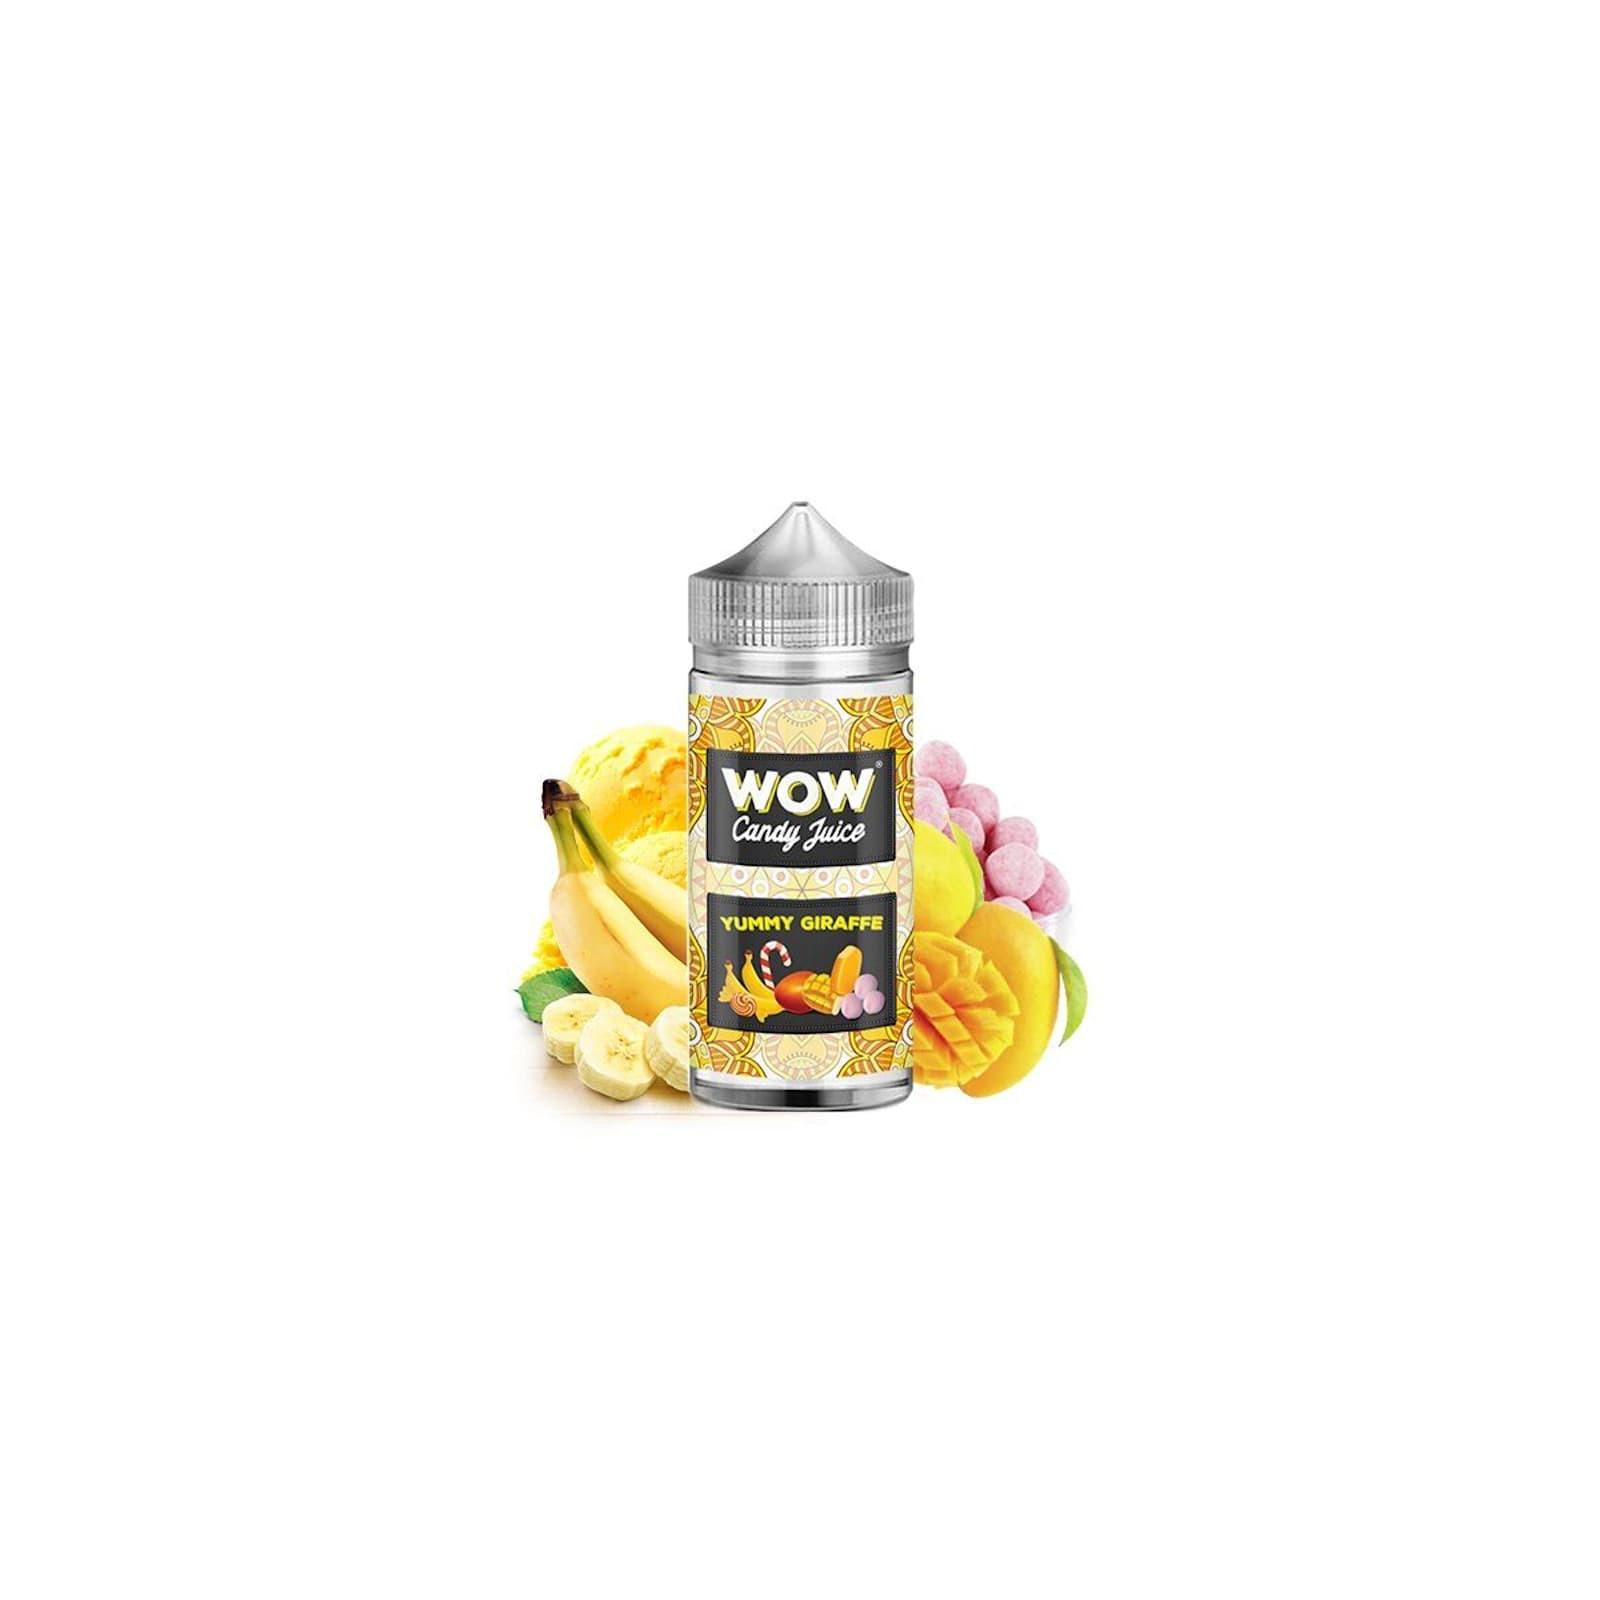 Yummy Giraffe 100ml - WOW Candy Juice